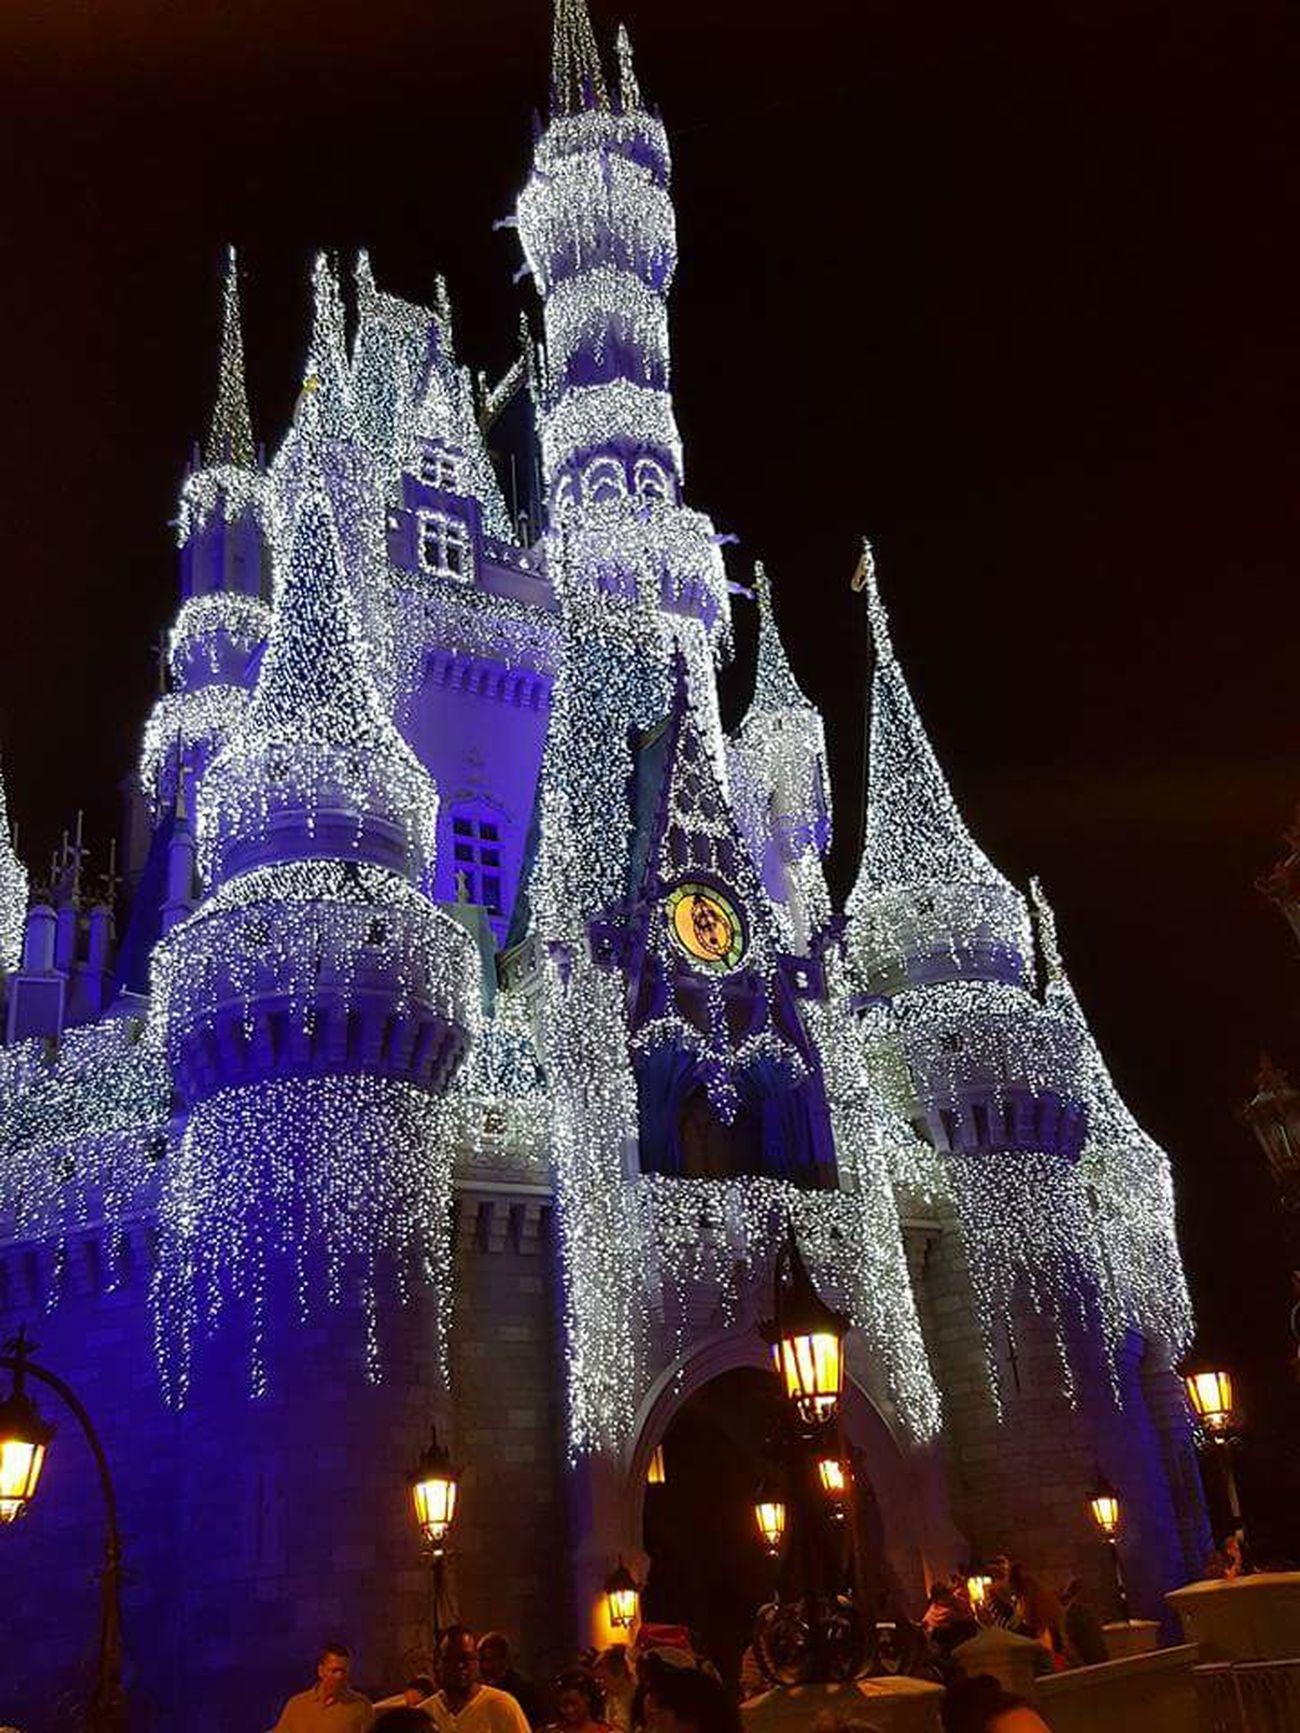 Cindarella's Castle Cinderella's Castle Lit Up Christmas Lights Walt Disney World Florida Frozen Inspired Gorgeous Shine Bright Like A Diamond